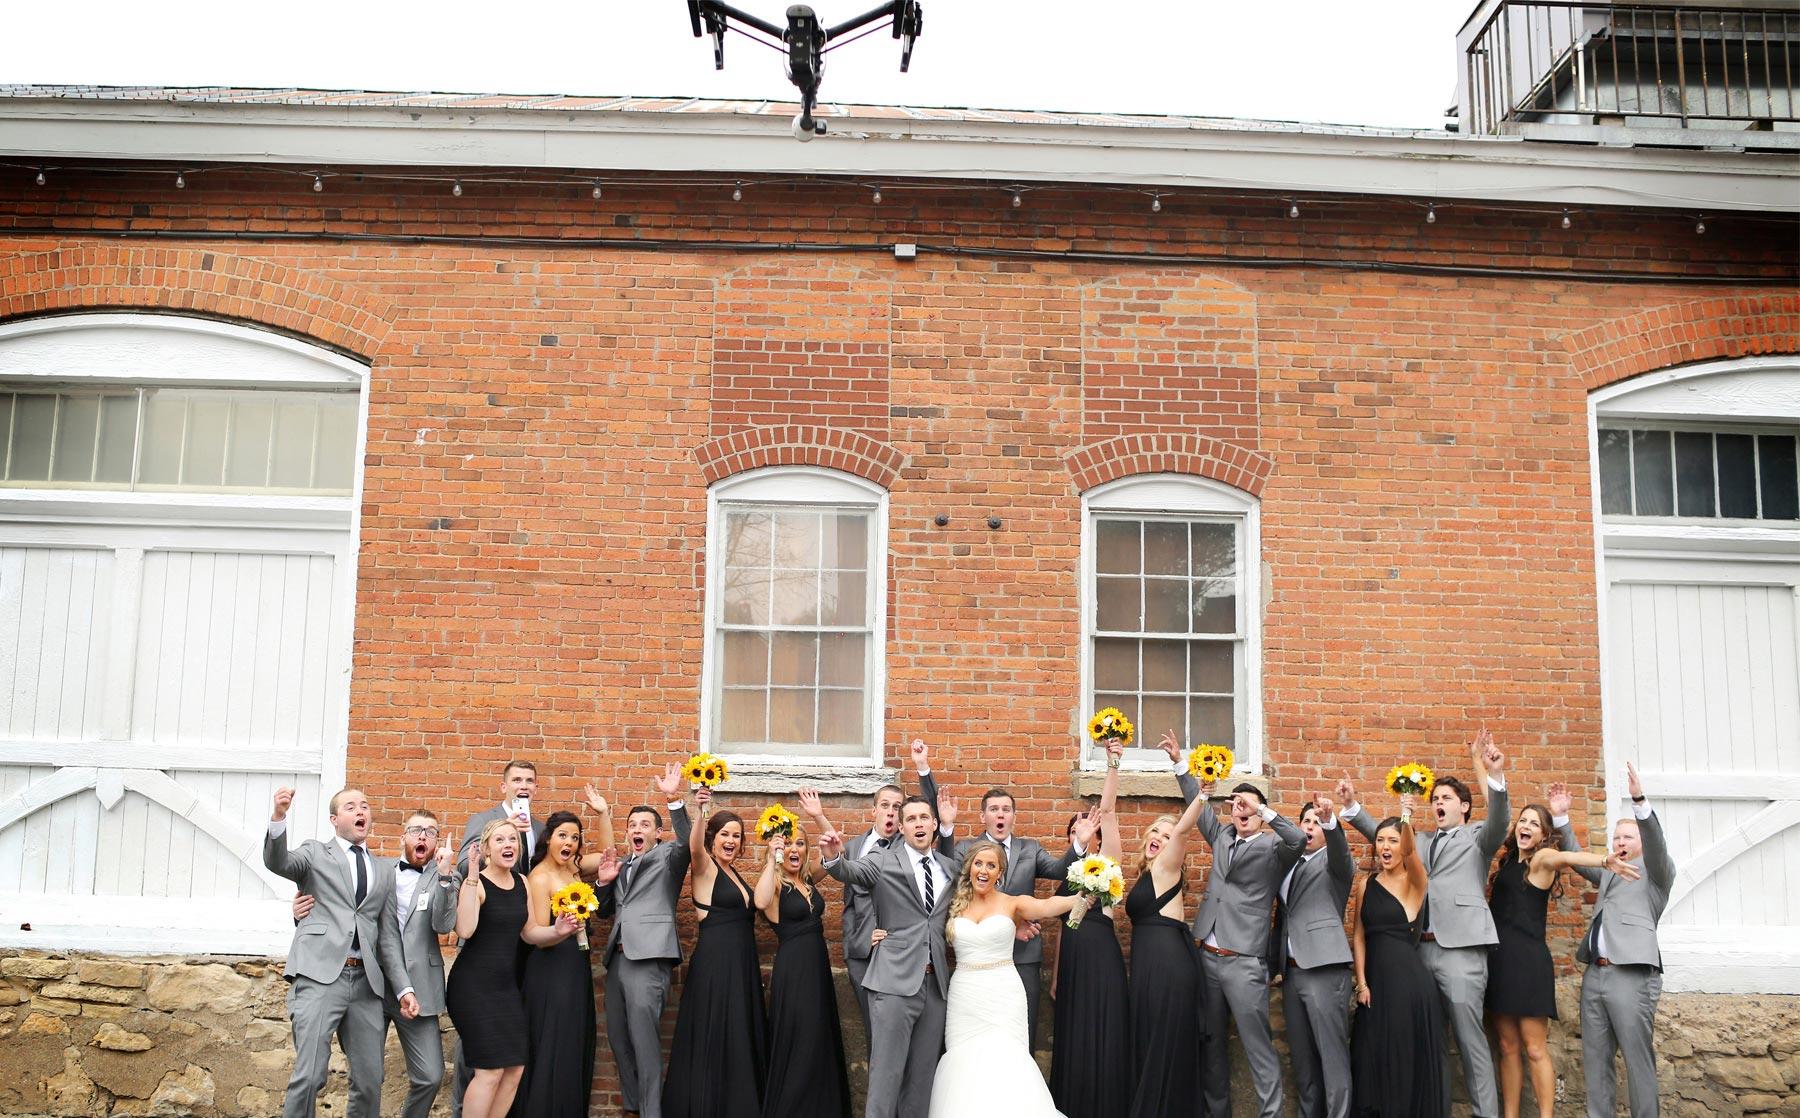 13-Stillwater-Minnesota-Wedding-Photographer-by-Andrew-Vick-Photography-Fall-Autumn-Bride-Groom-Bridal-Party-Bridesmaids-Groomsmen-Drone-Micaela-and-Derek.jpg